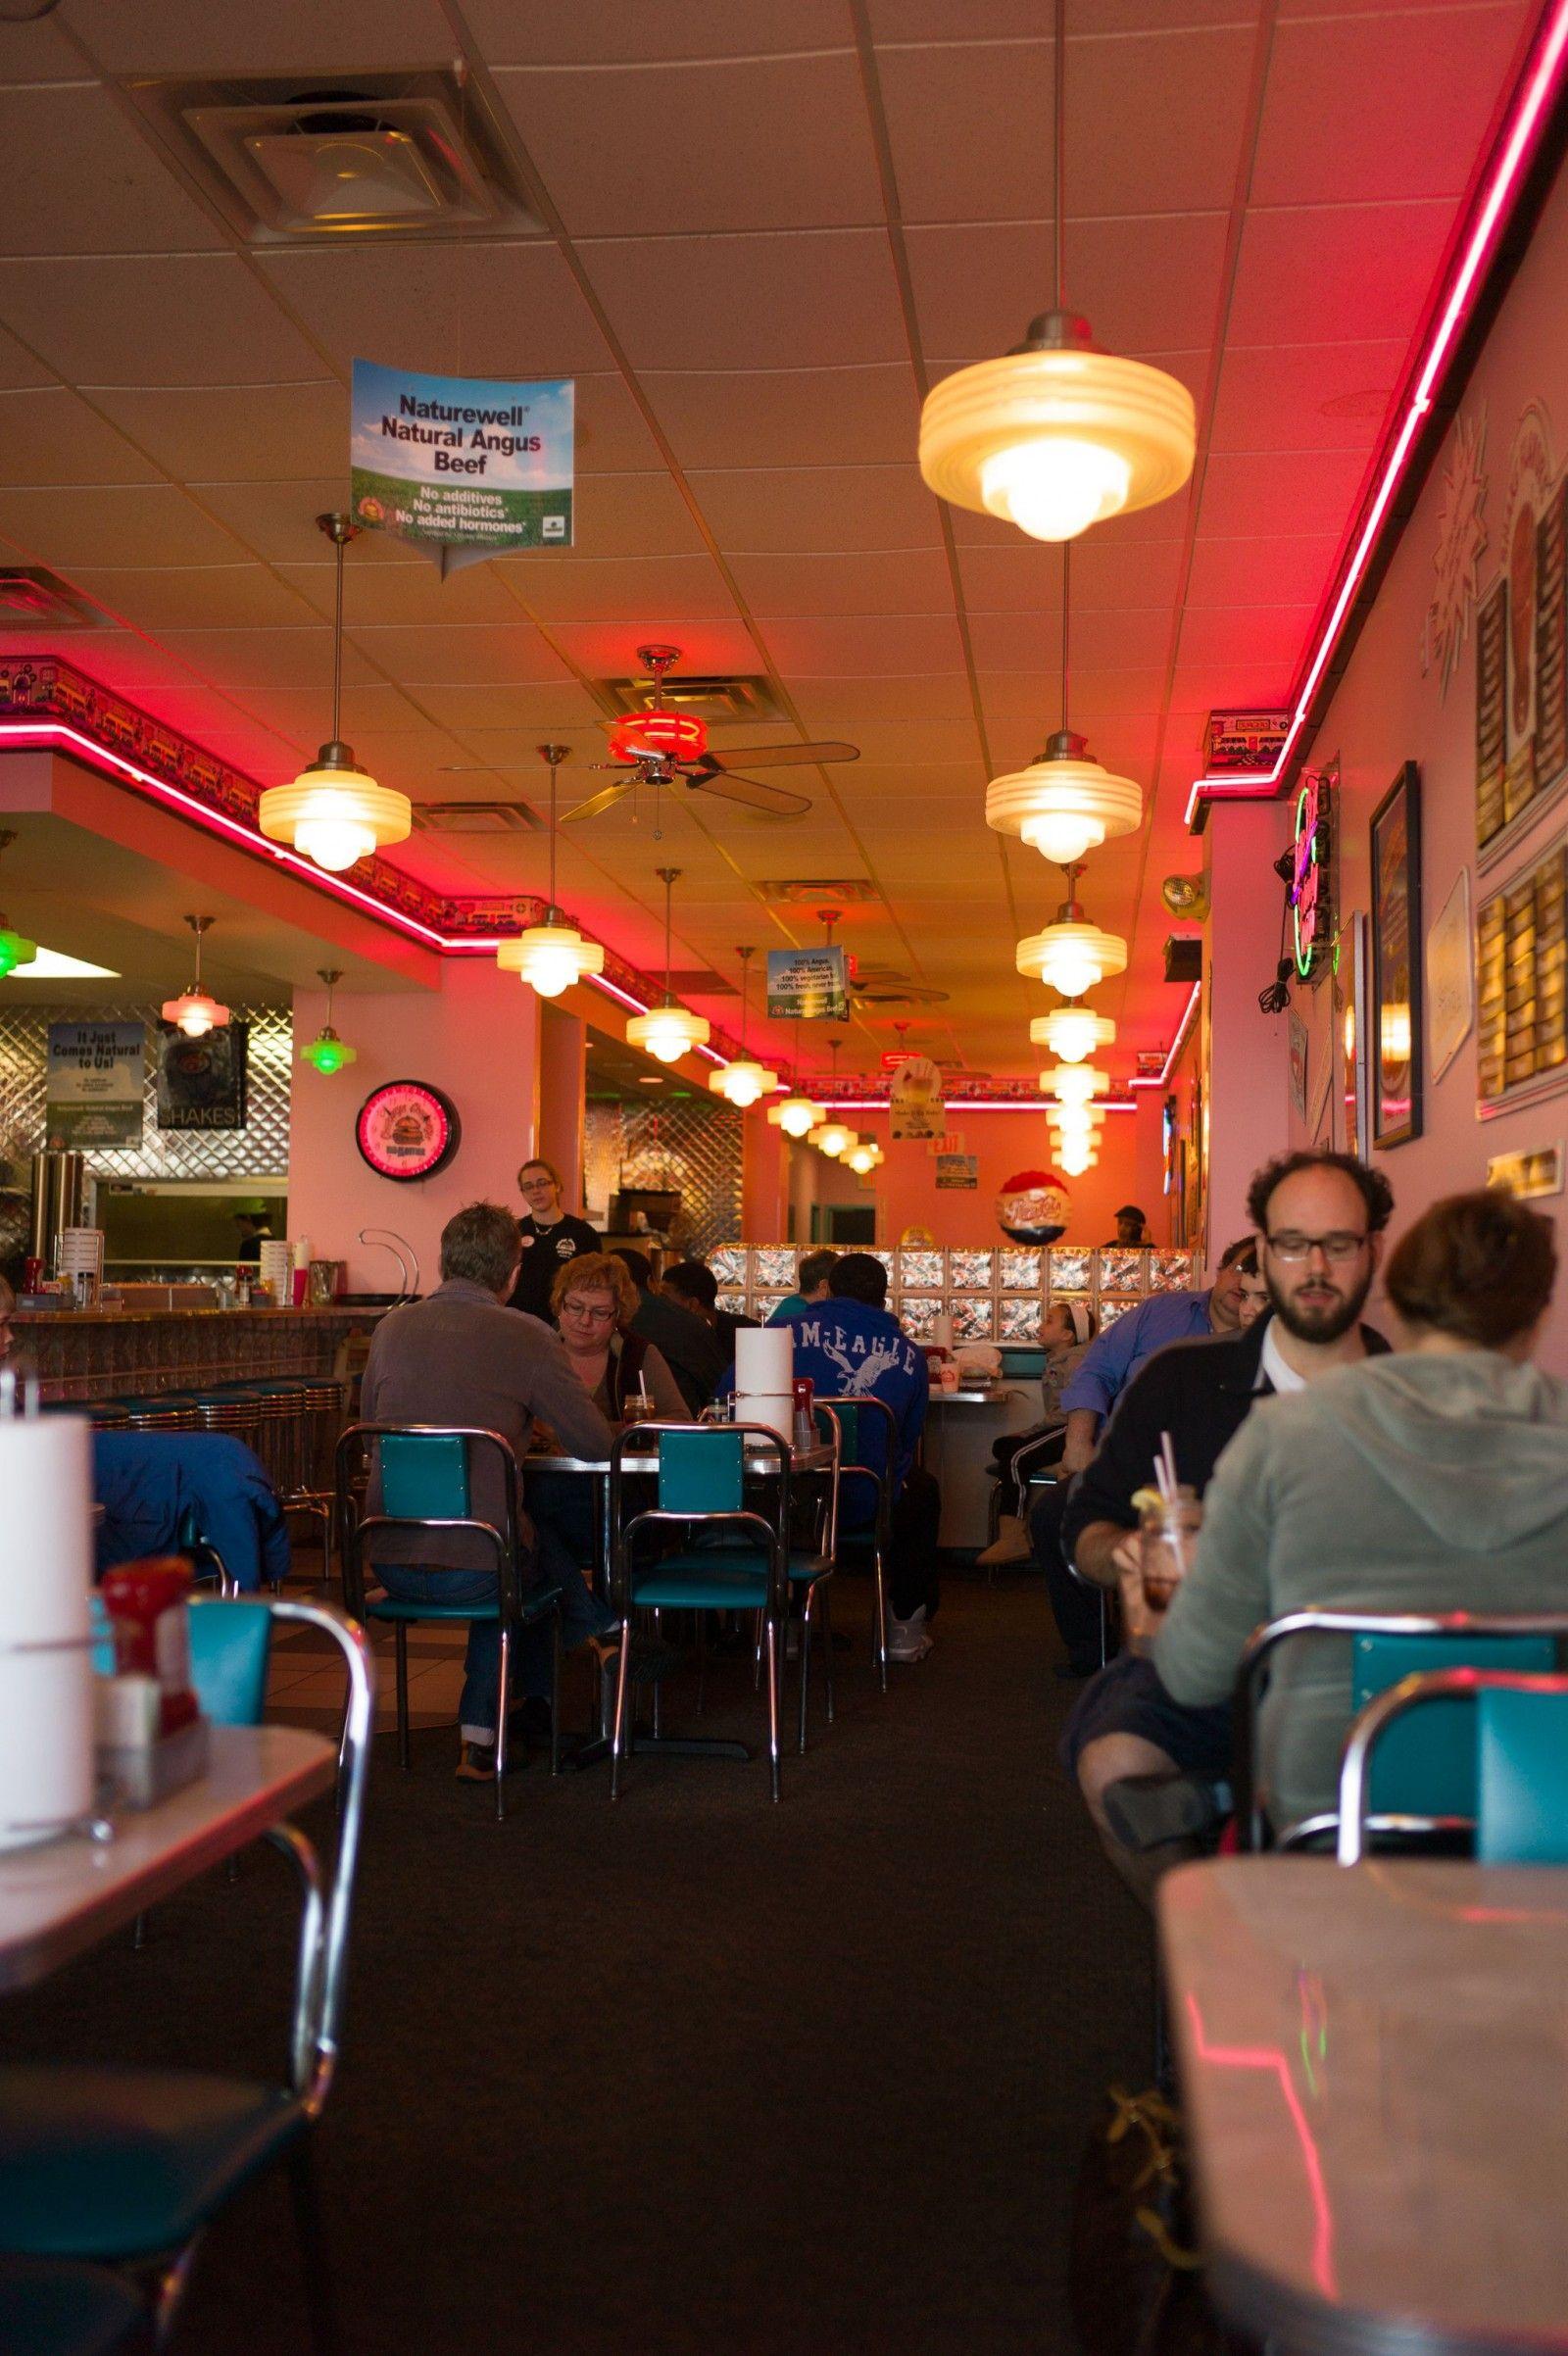 usa_pensylvania_burger_restaurant_m9p_leica_summicron_35mm_jipvankuijk